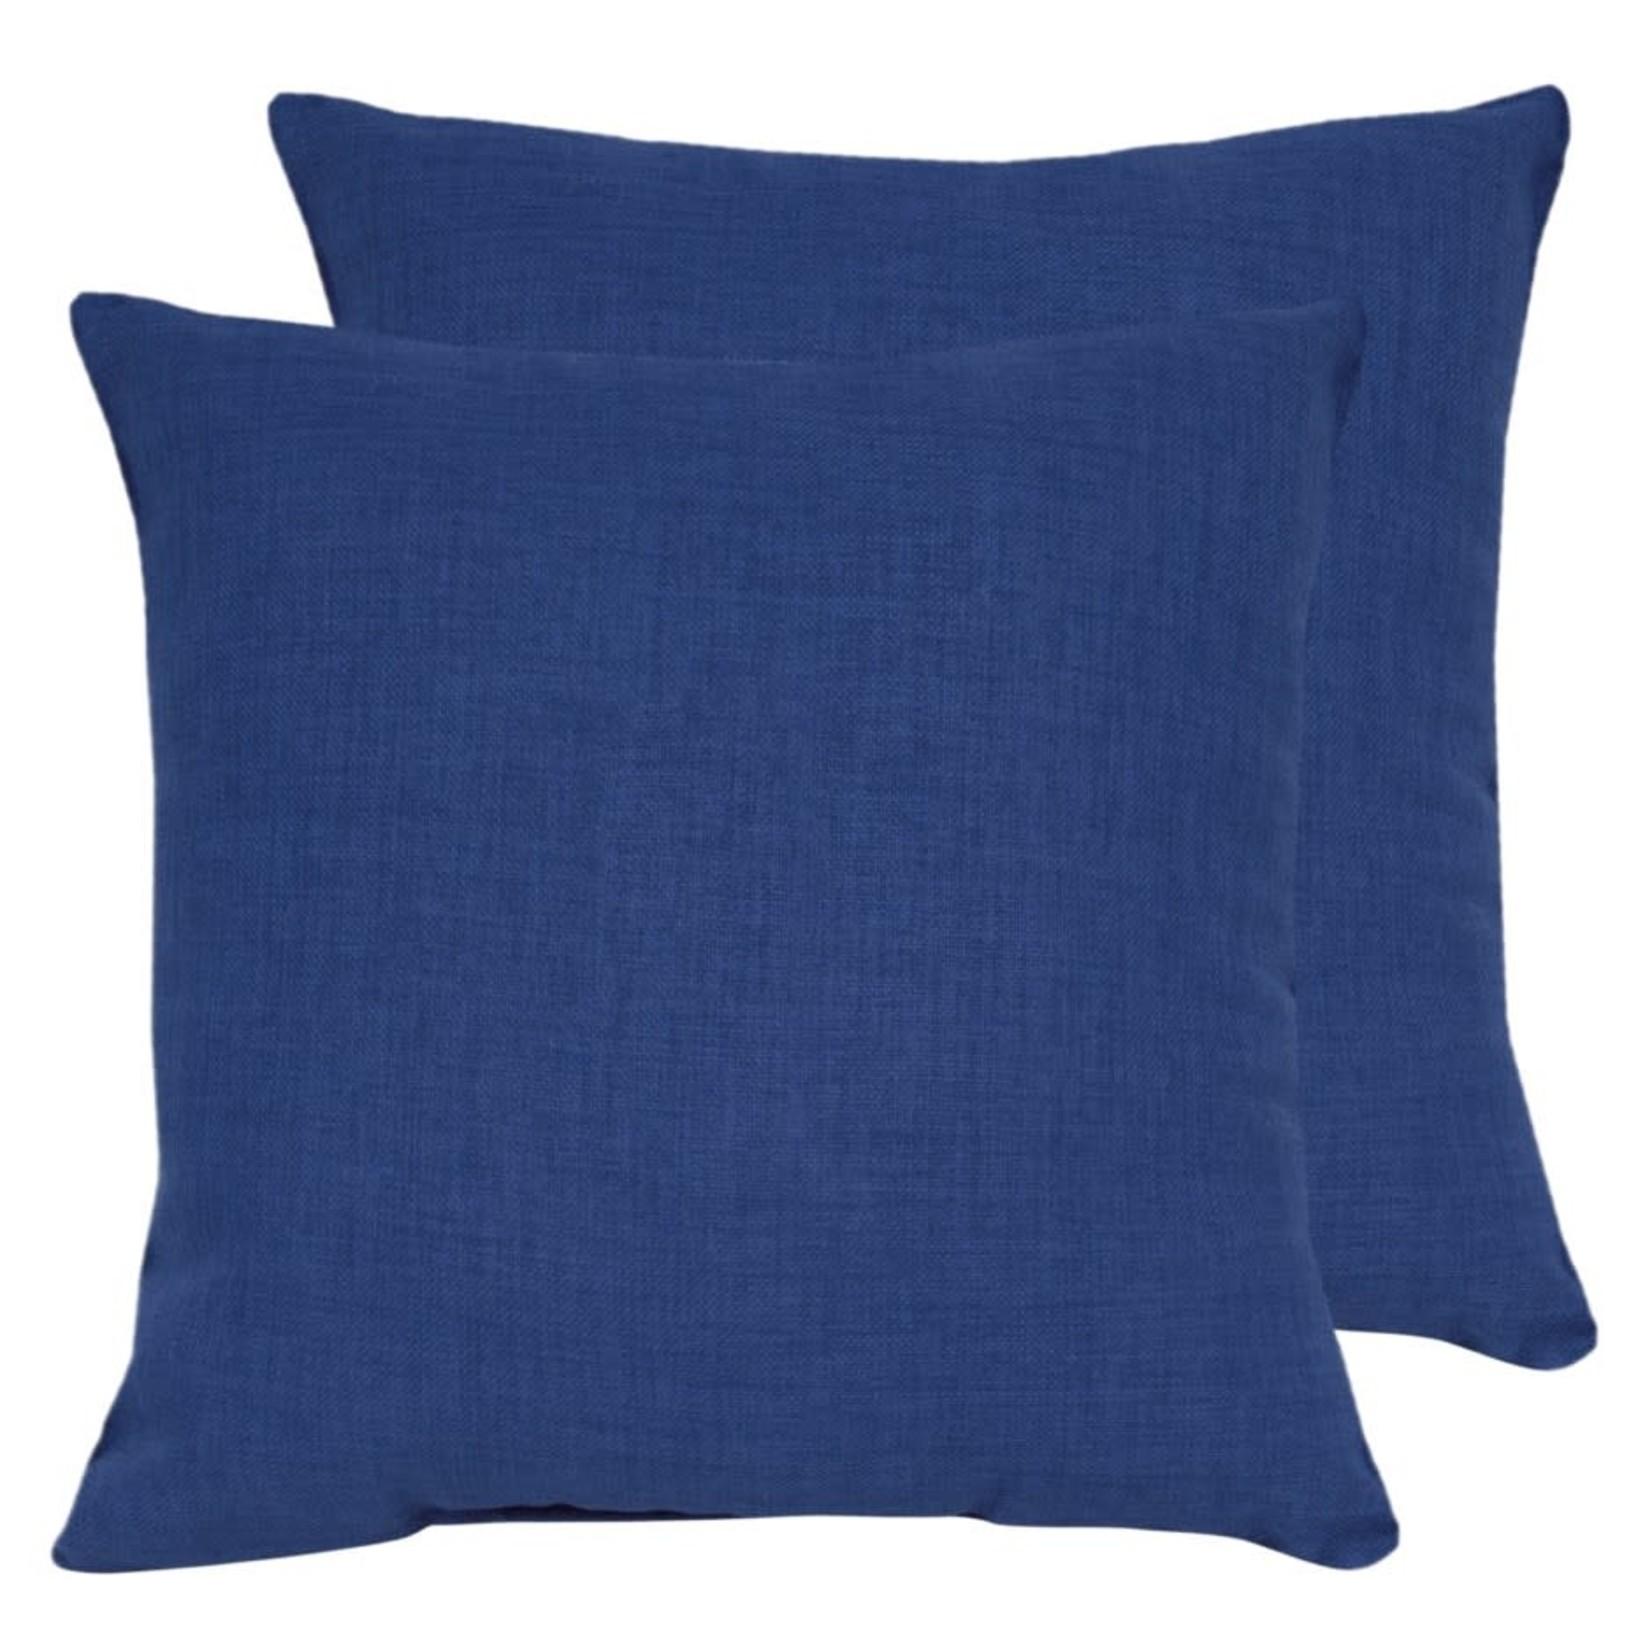 Royal Blue Outdoor Pillow